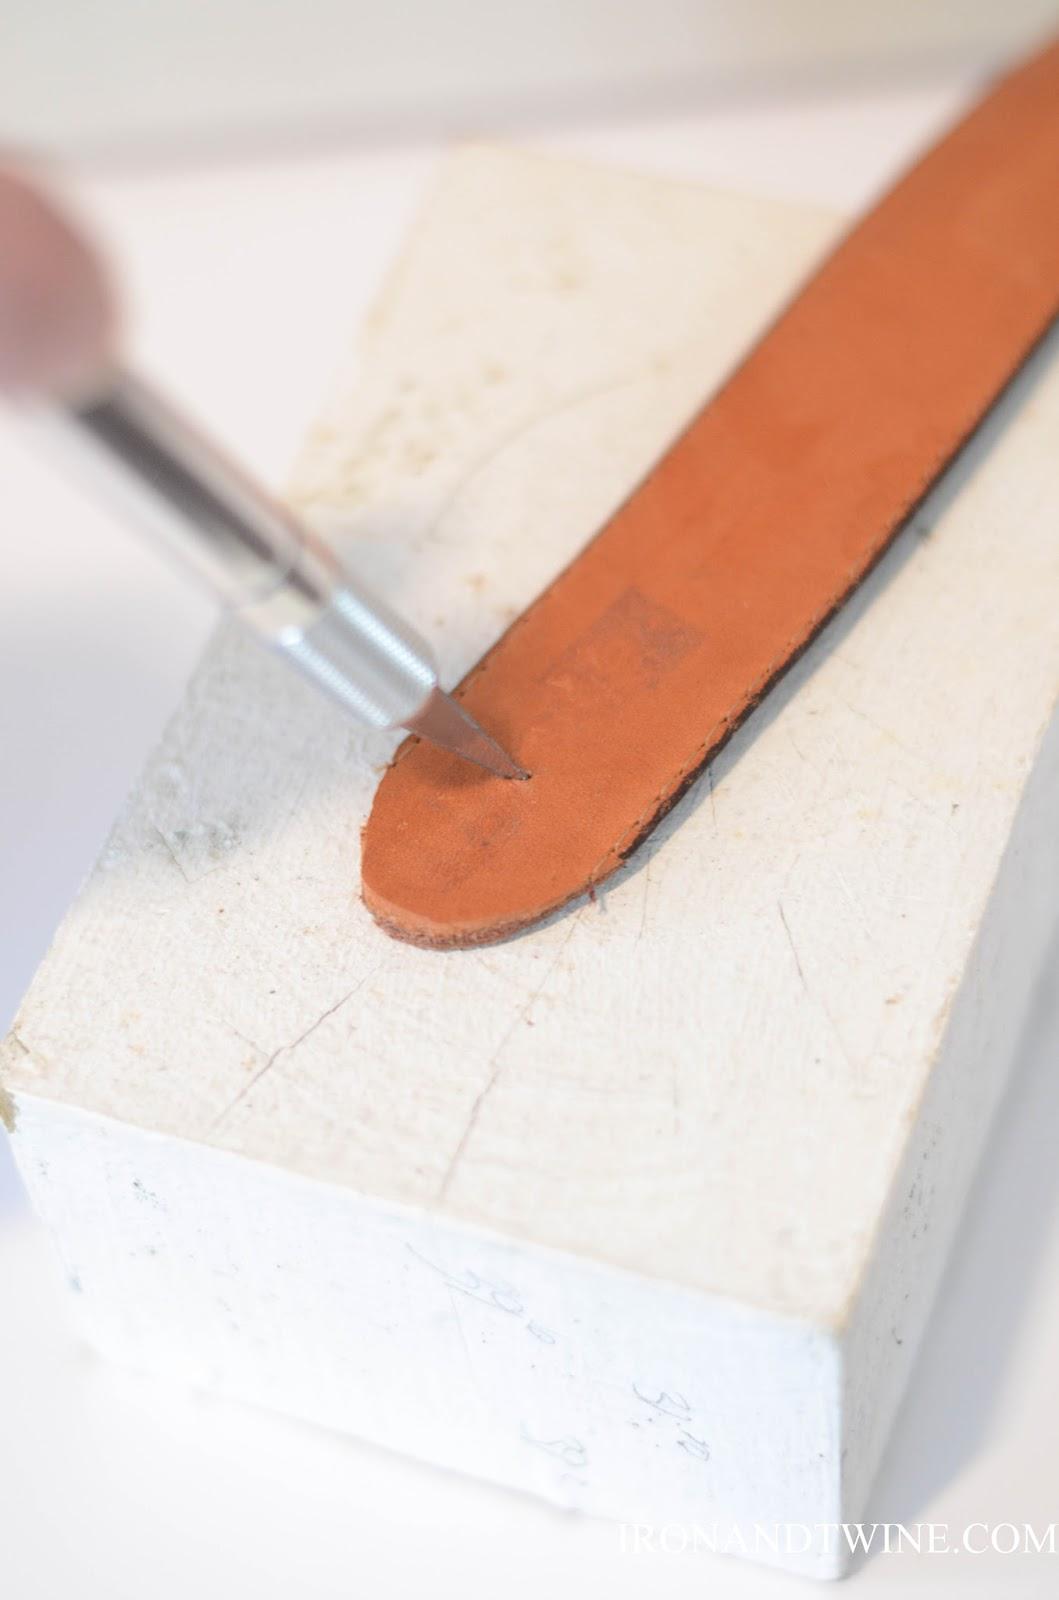 DIY+Belt+Handled+Box,+DIY+fabric+covered+box,+Iron+and+Twine+(9).jpg